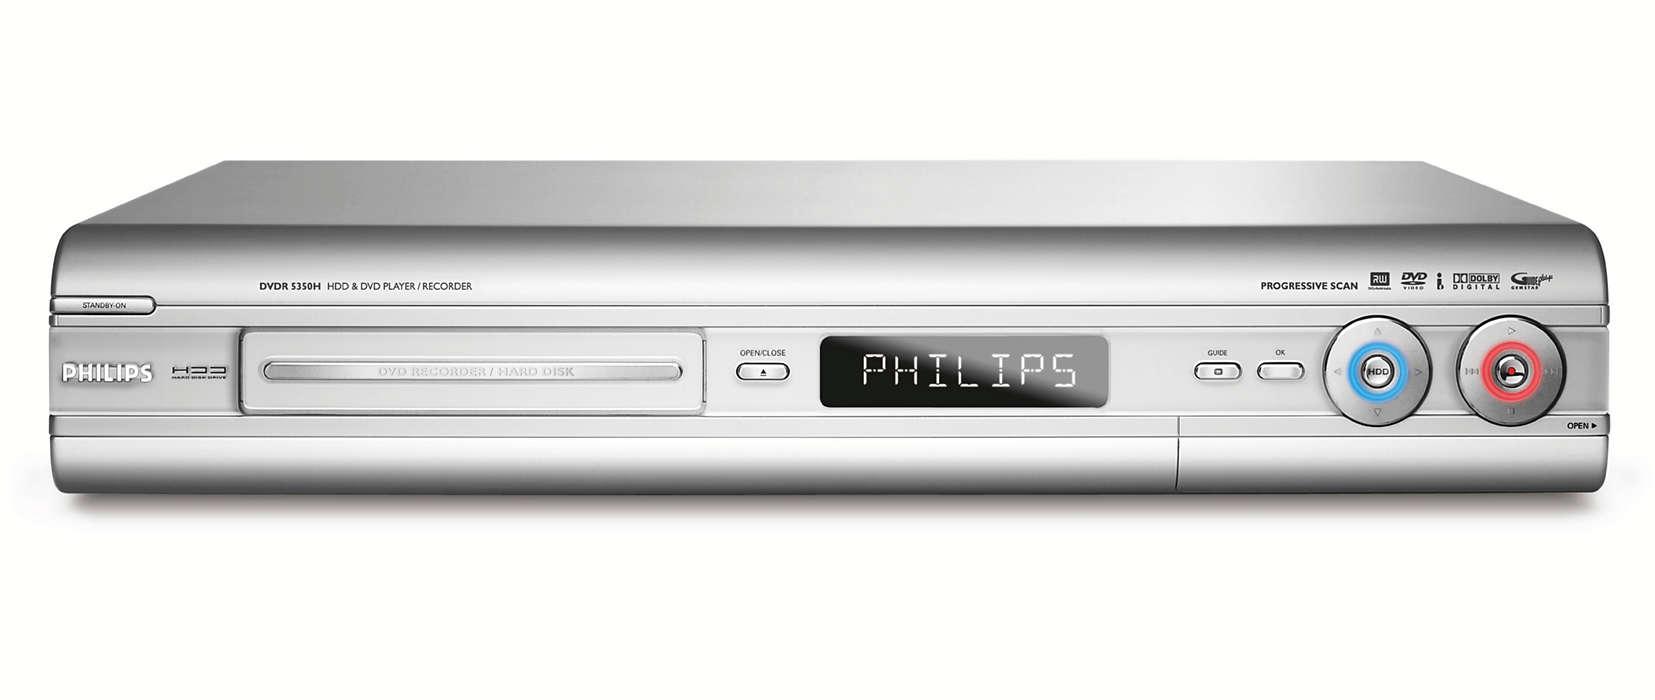 Hard disk/DVD recorder DVDR5350H/05 | Philips